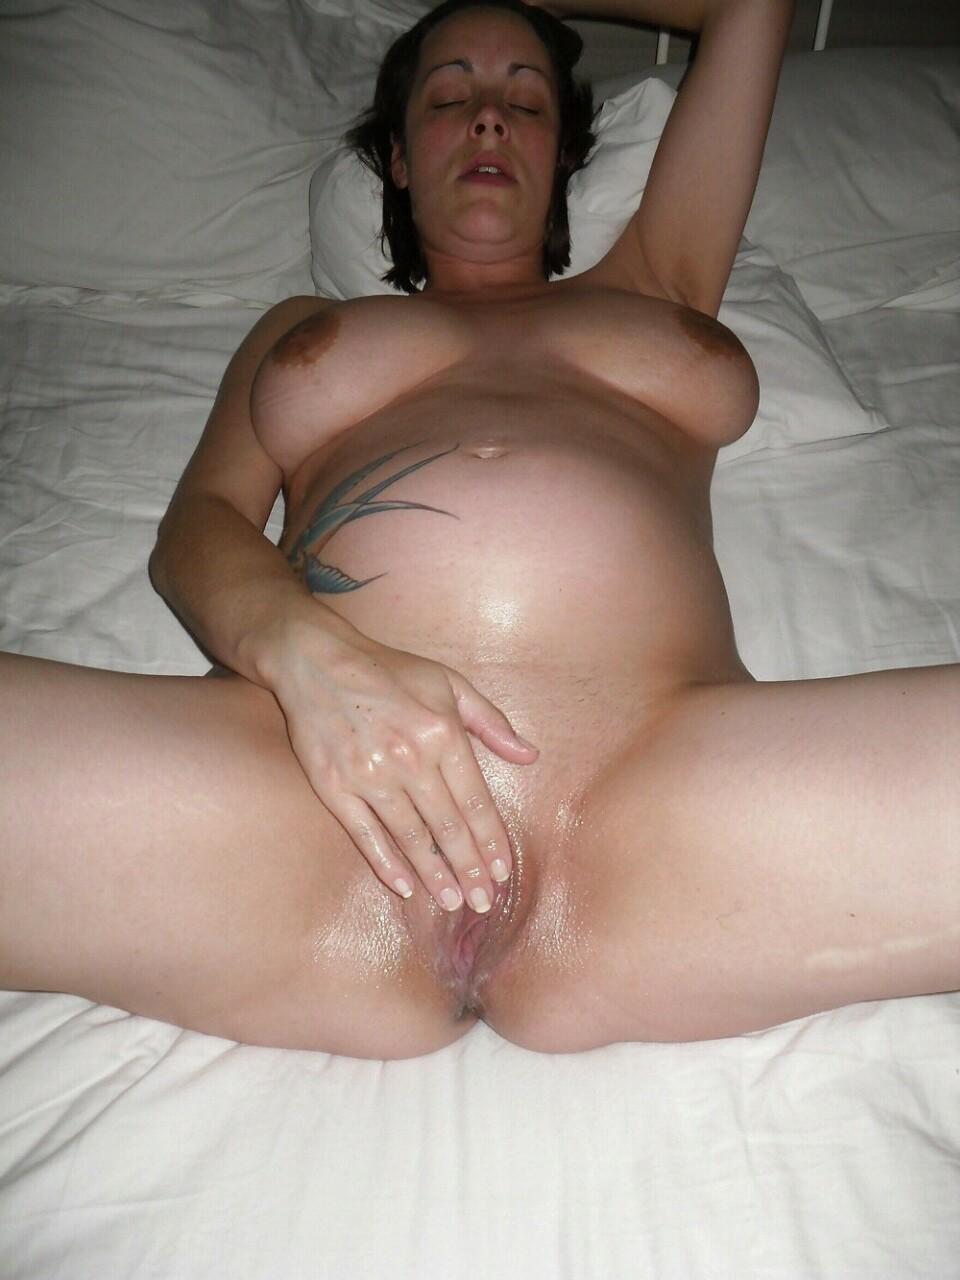 Amateur milf pregnant dripping